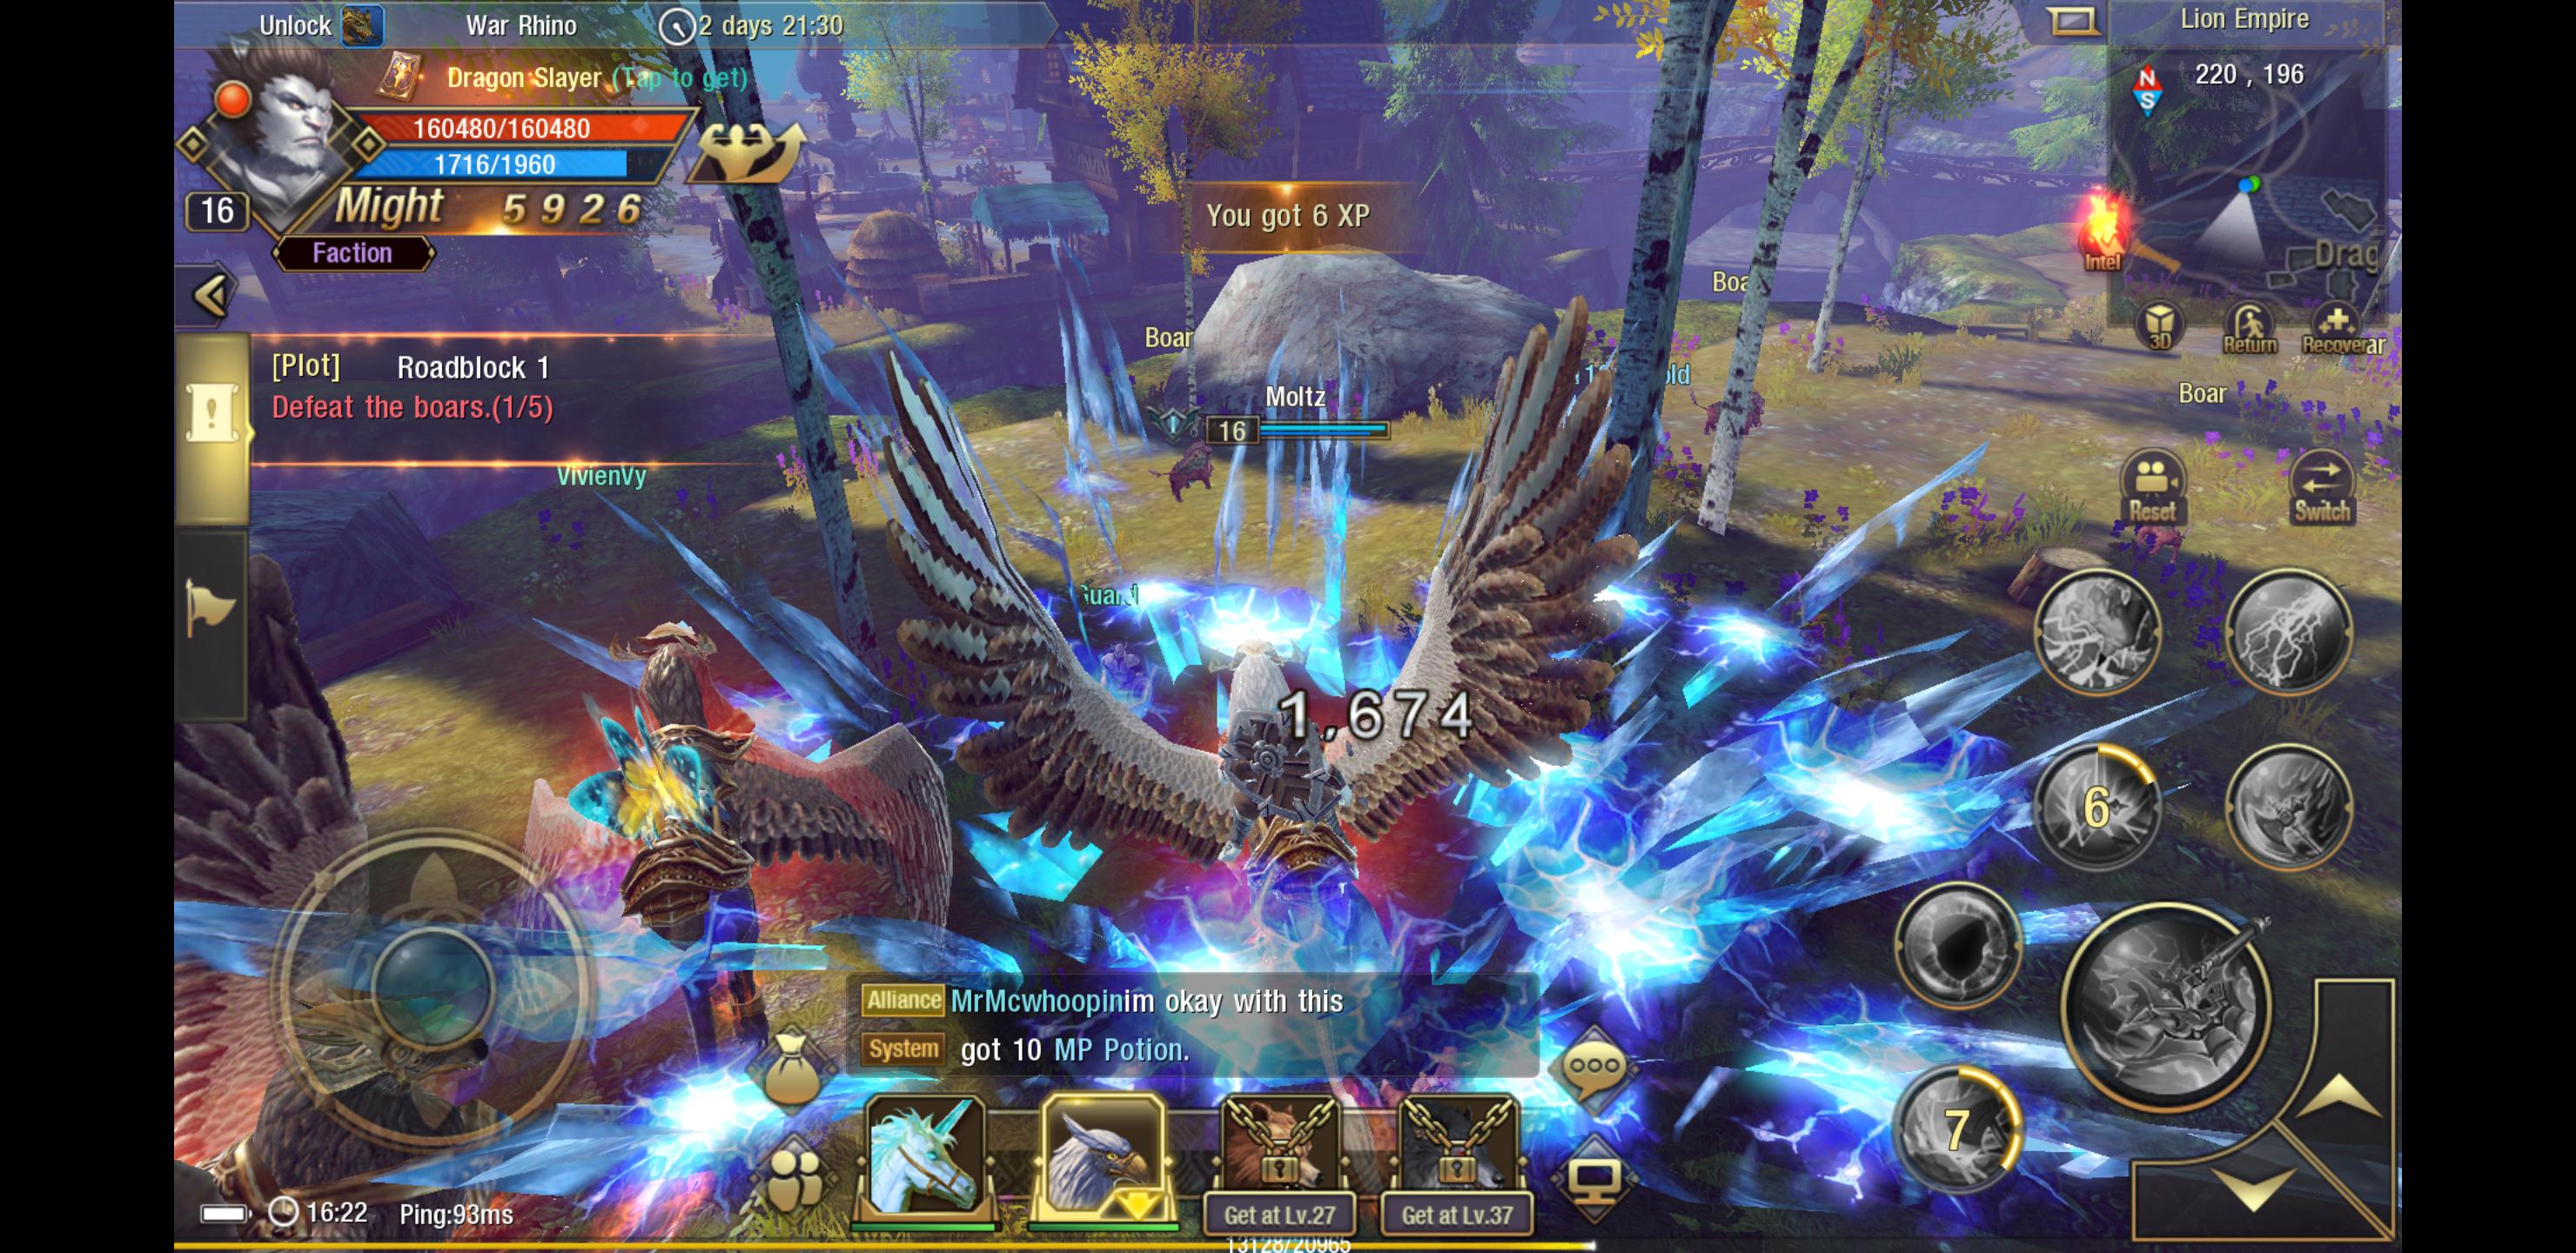 Hands-on] Taichi Panda 3: Dragon Hunter, a beautiful MMORPG